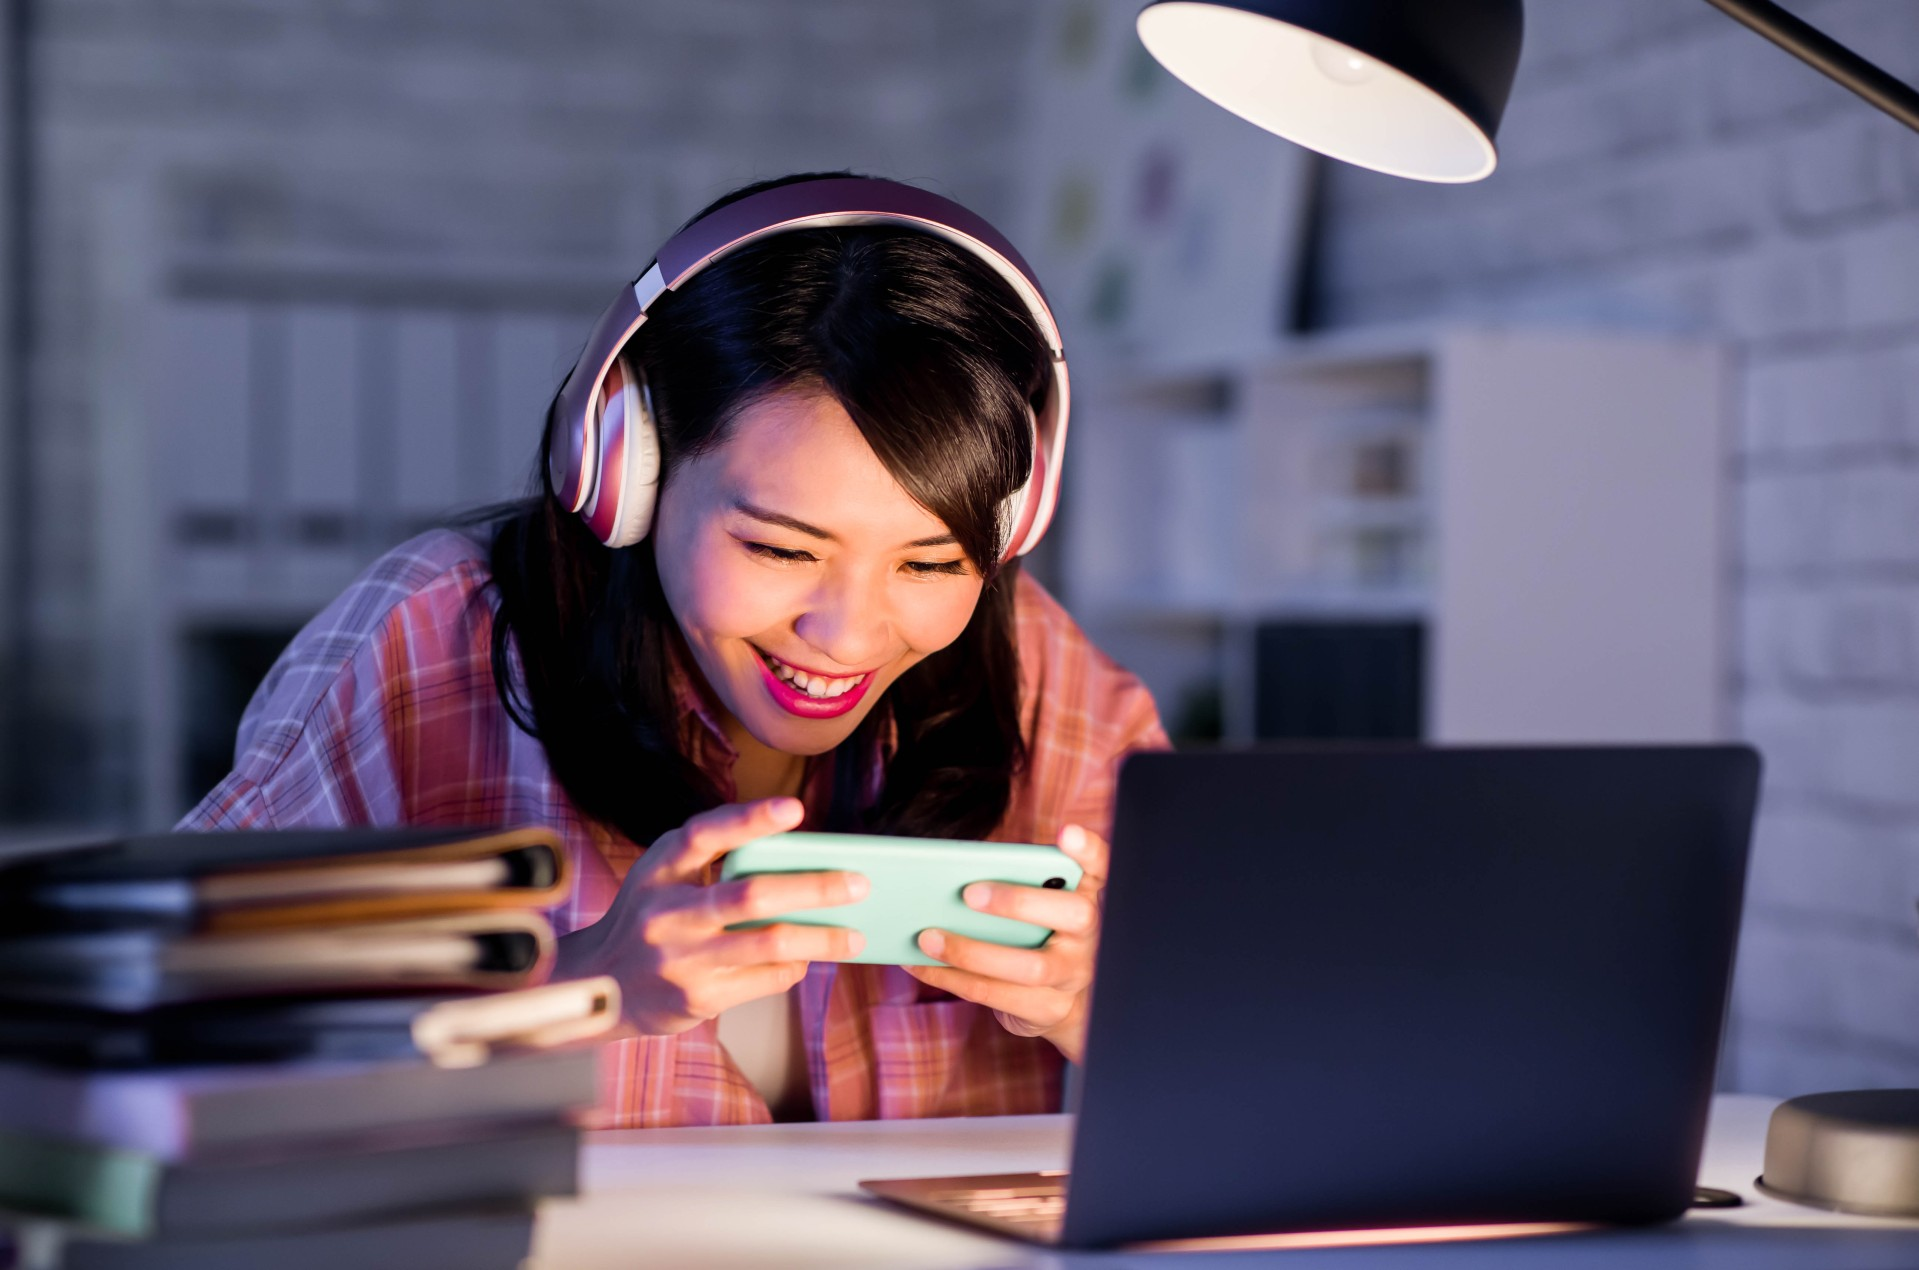 teen girl mobile gaming